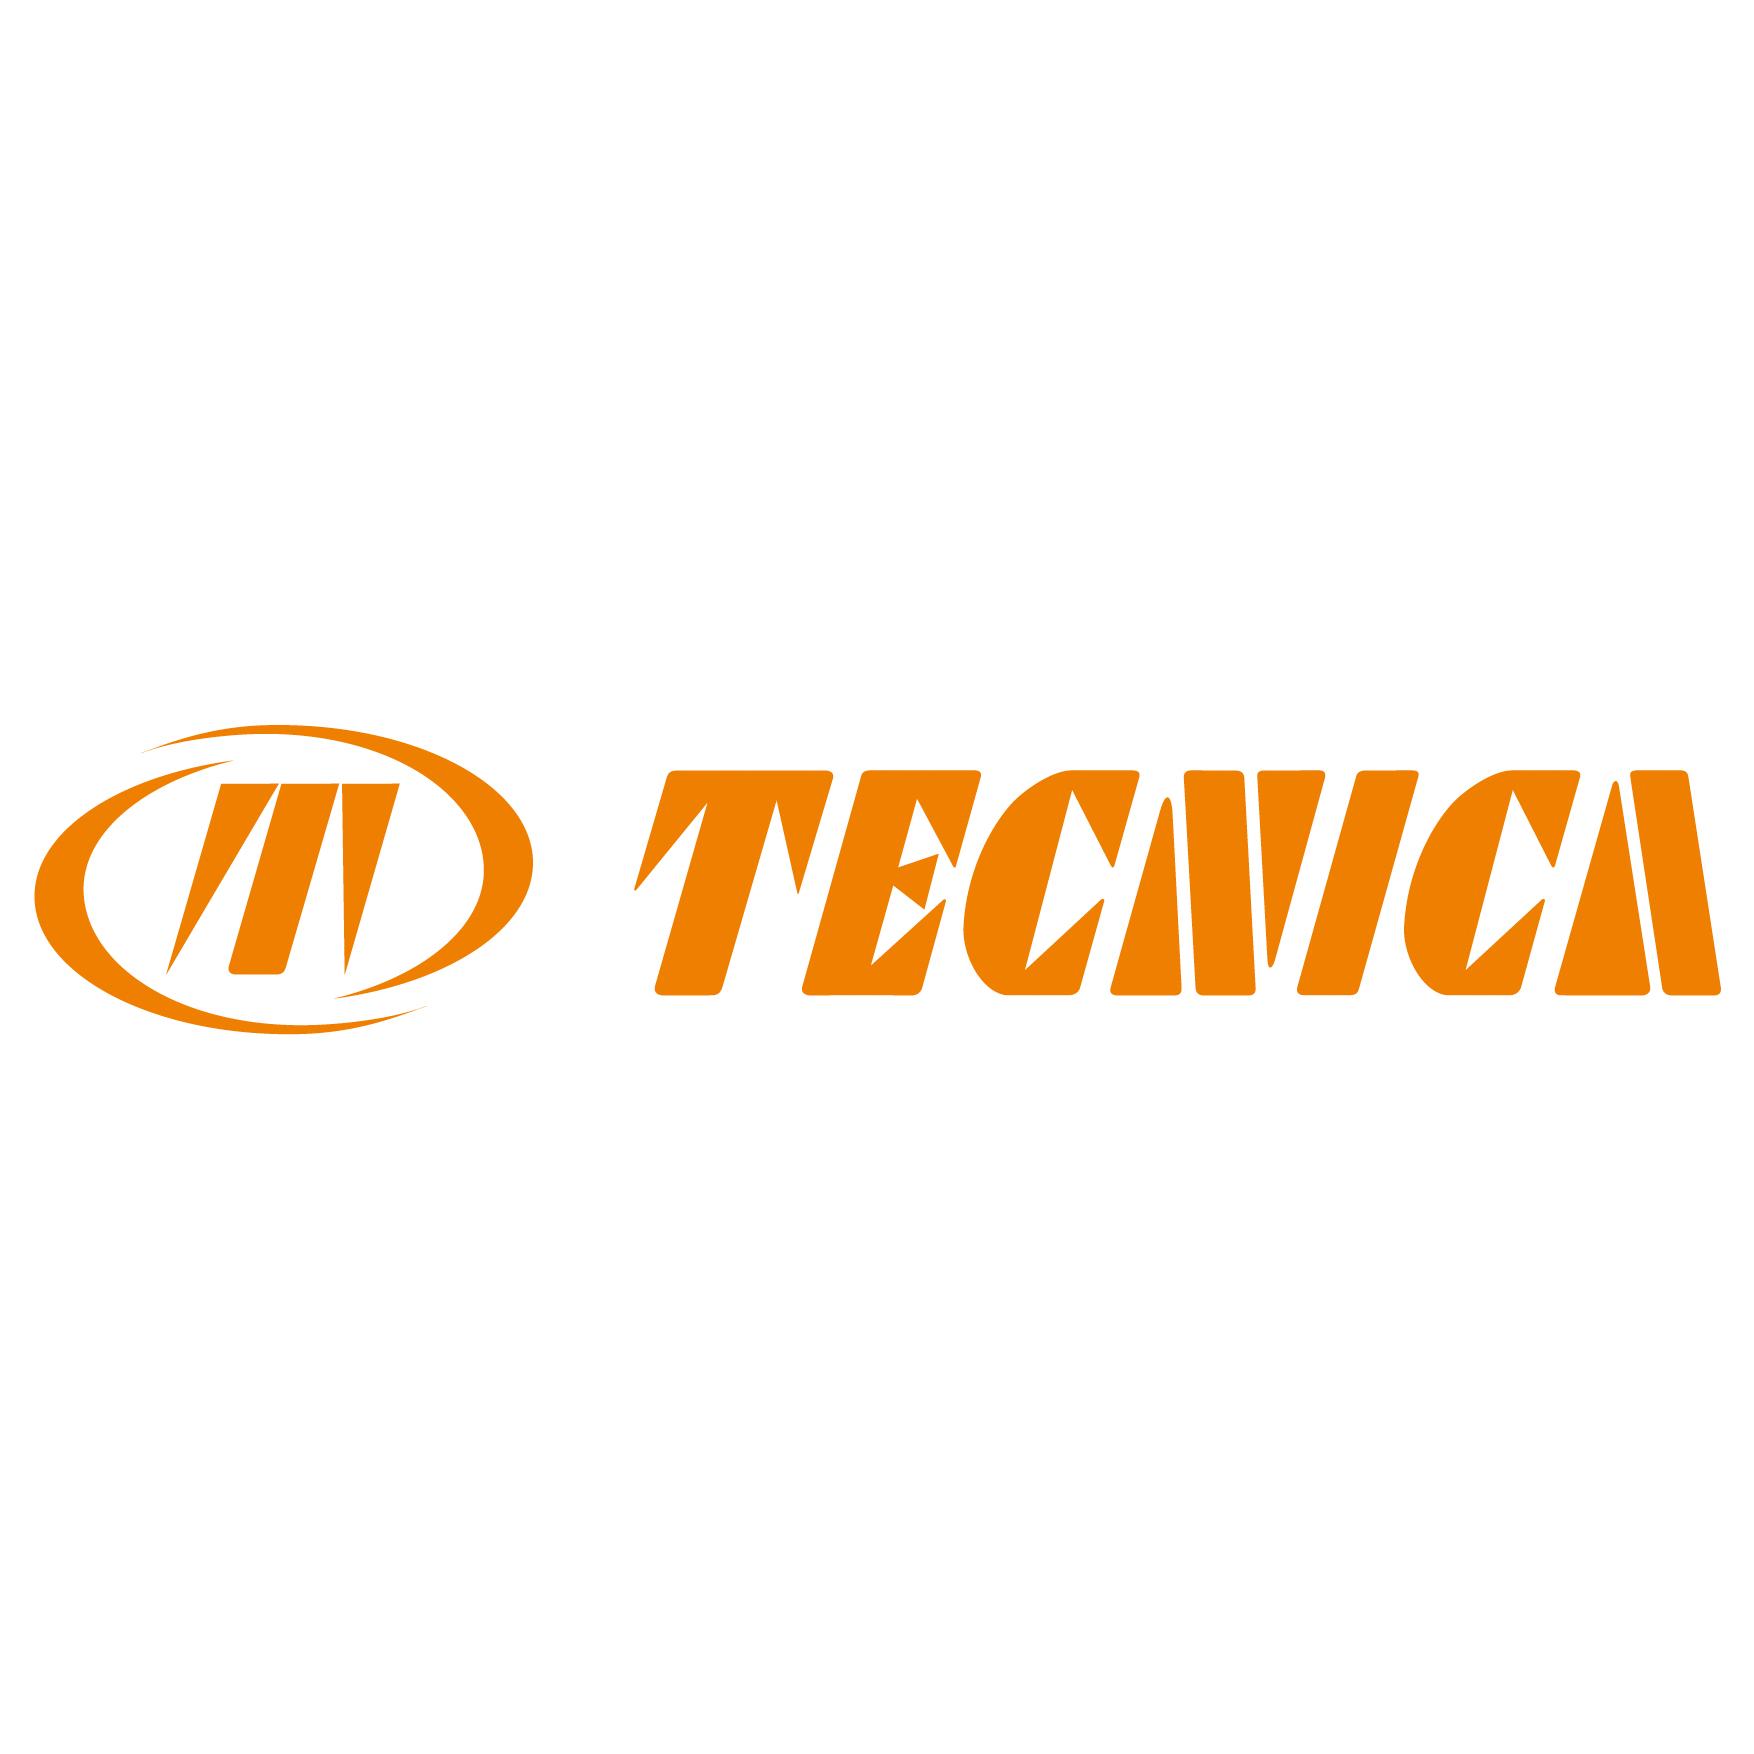 logo-tecnica-01.jpg